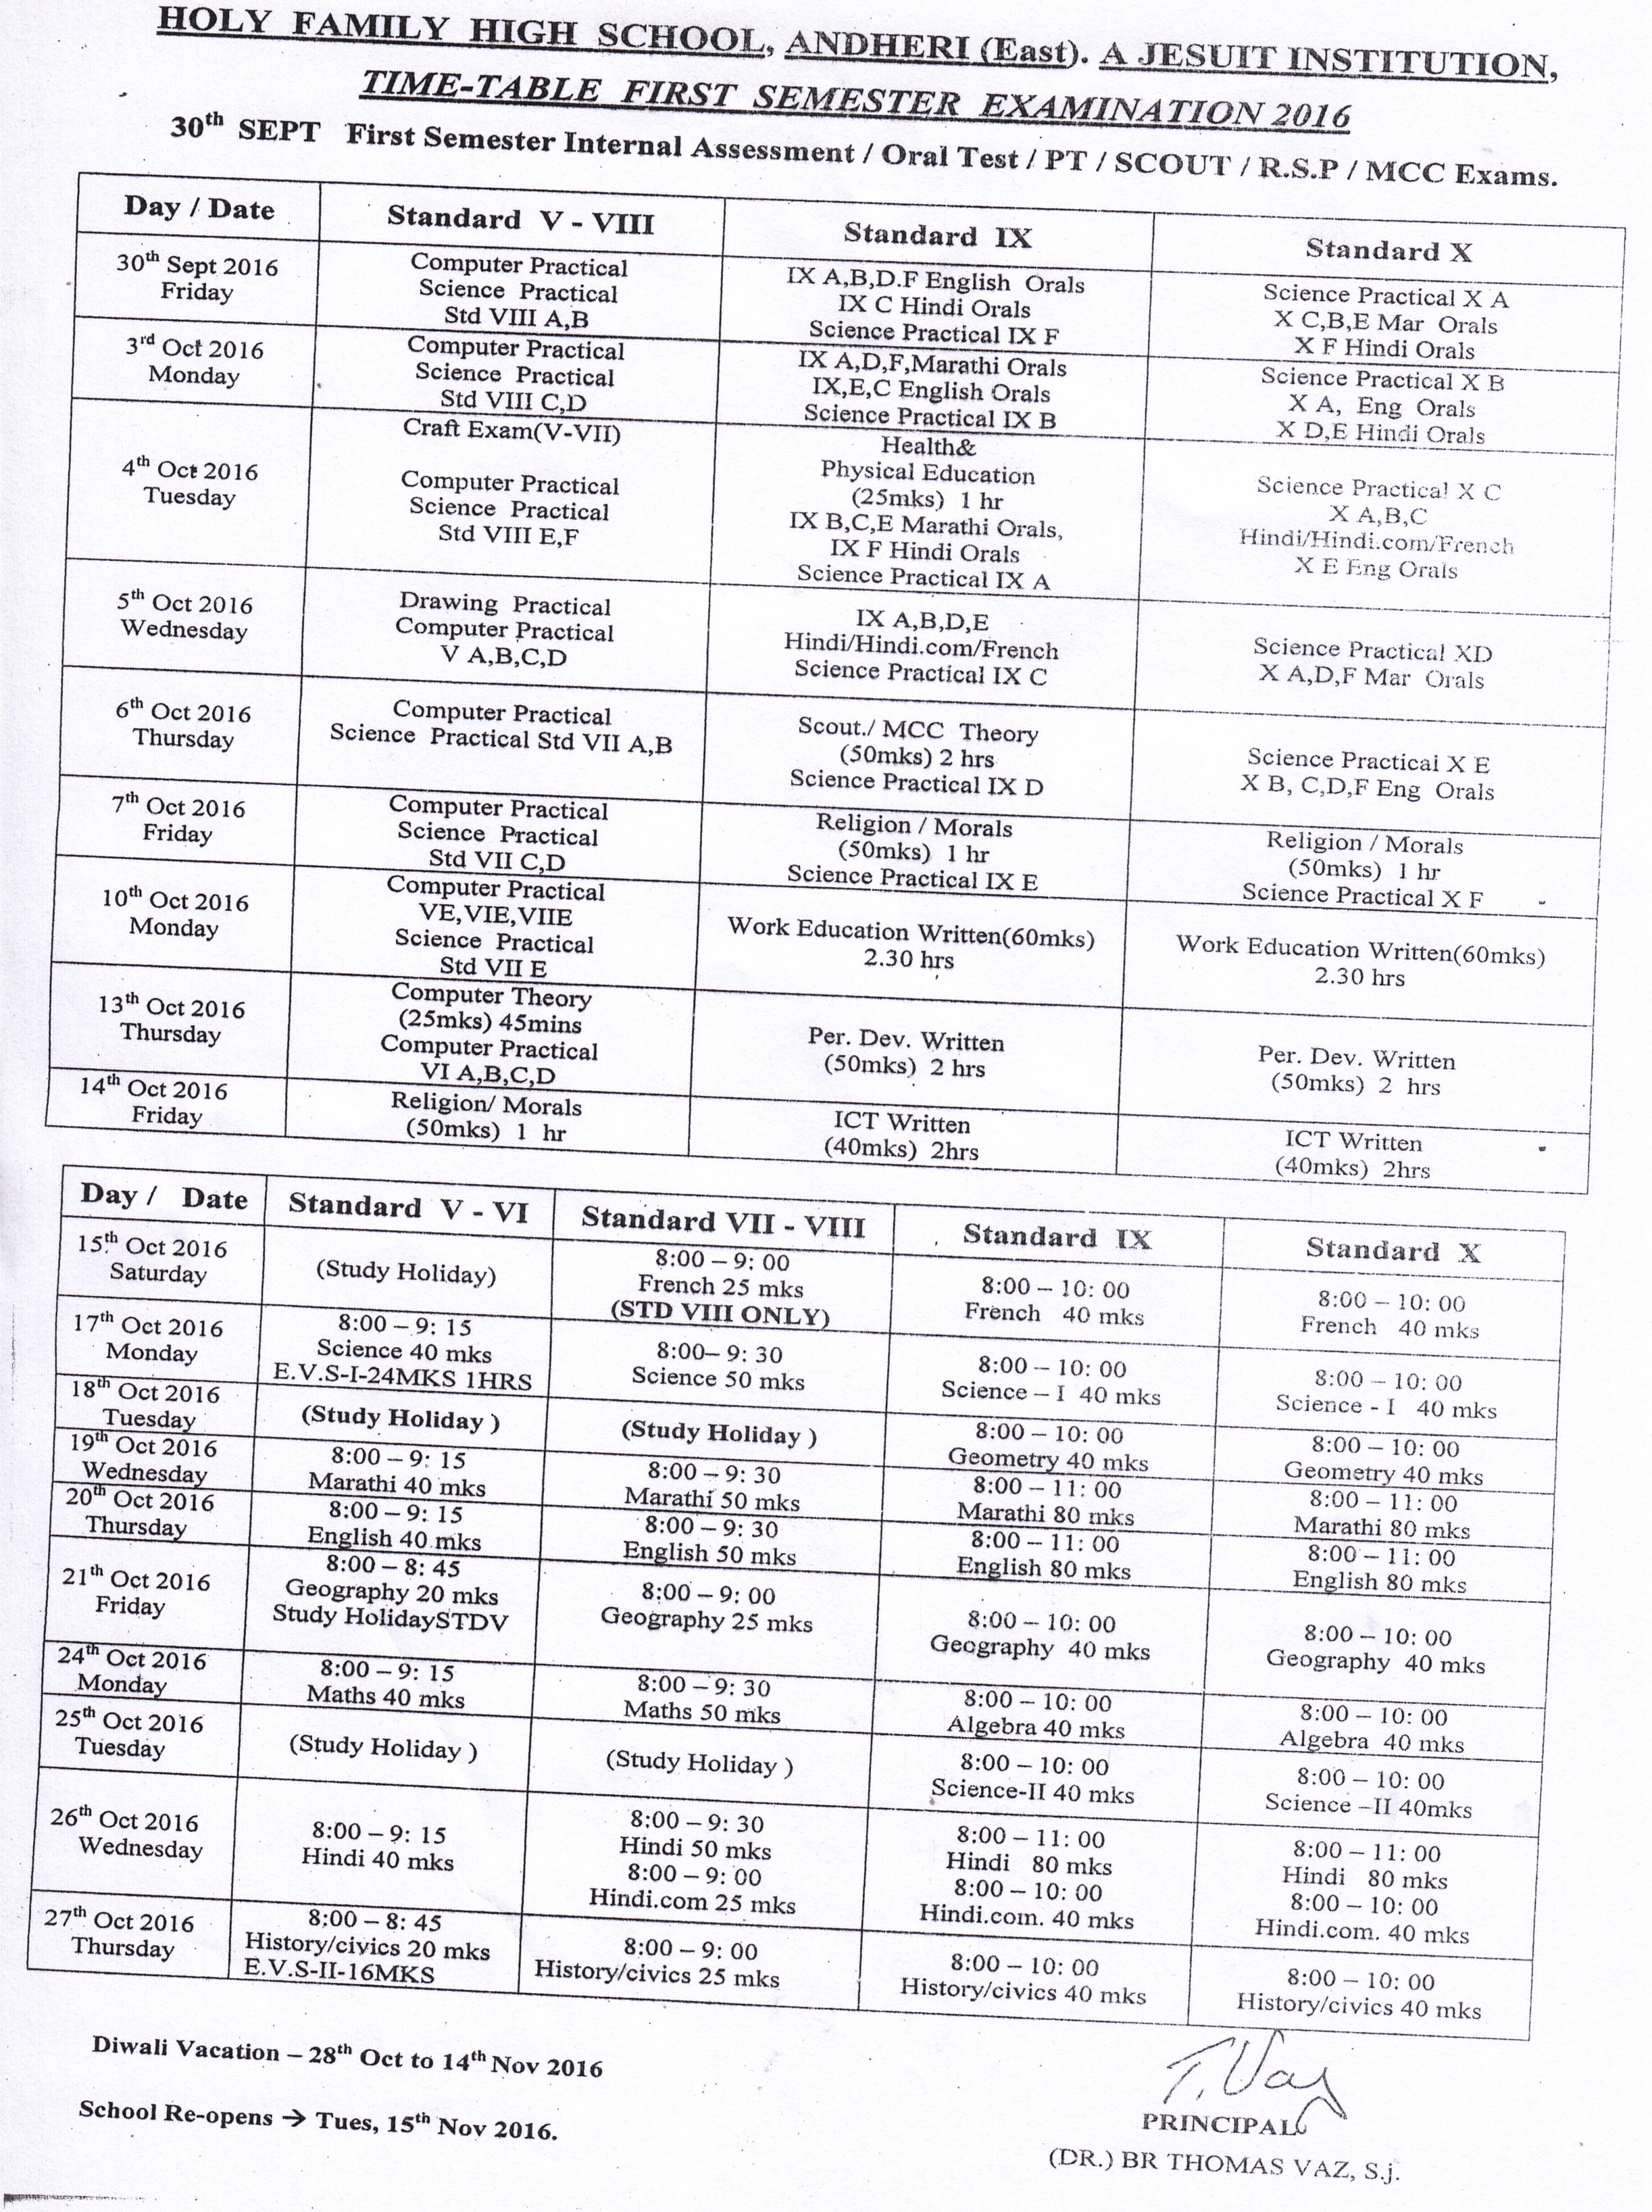 1st Terminal Examination Time Table